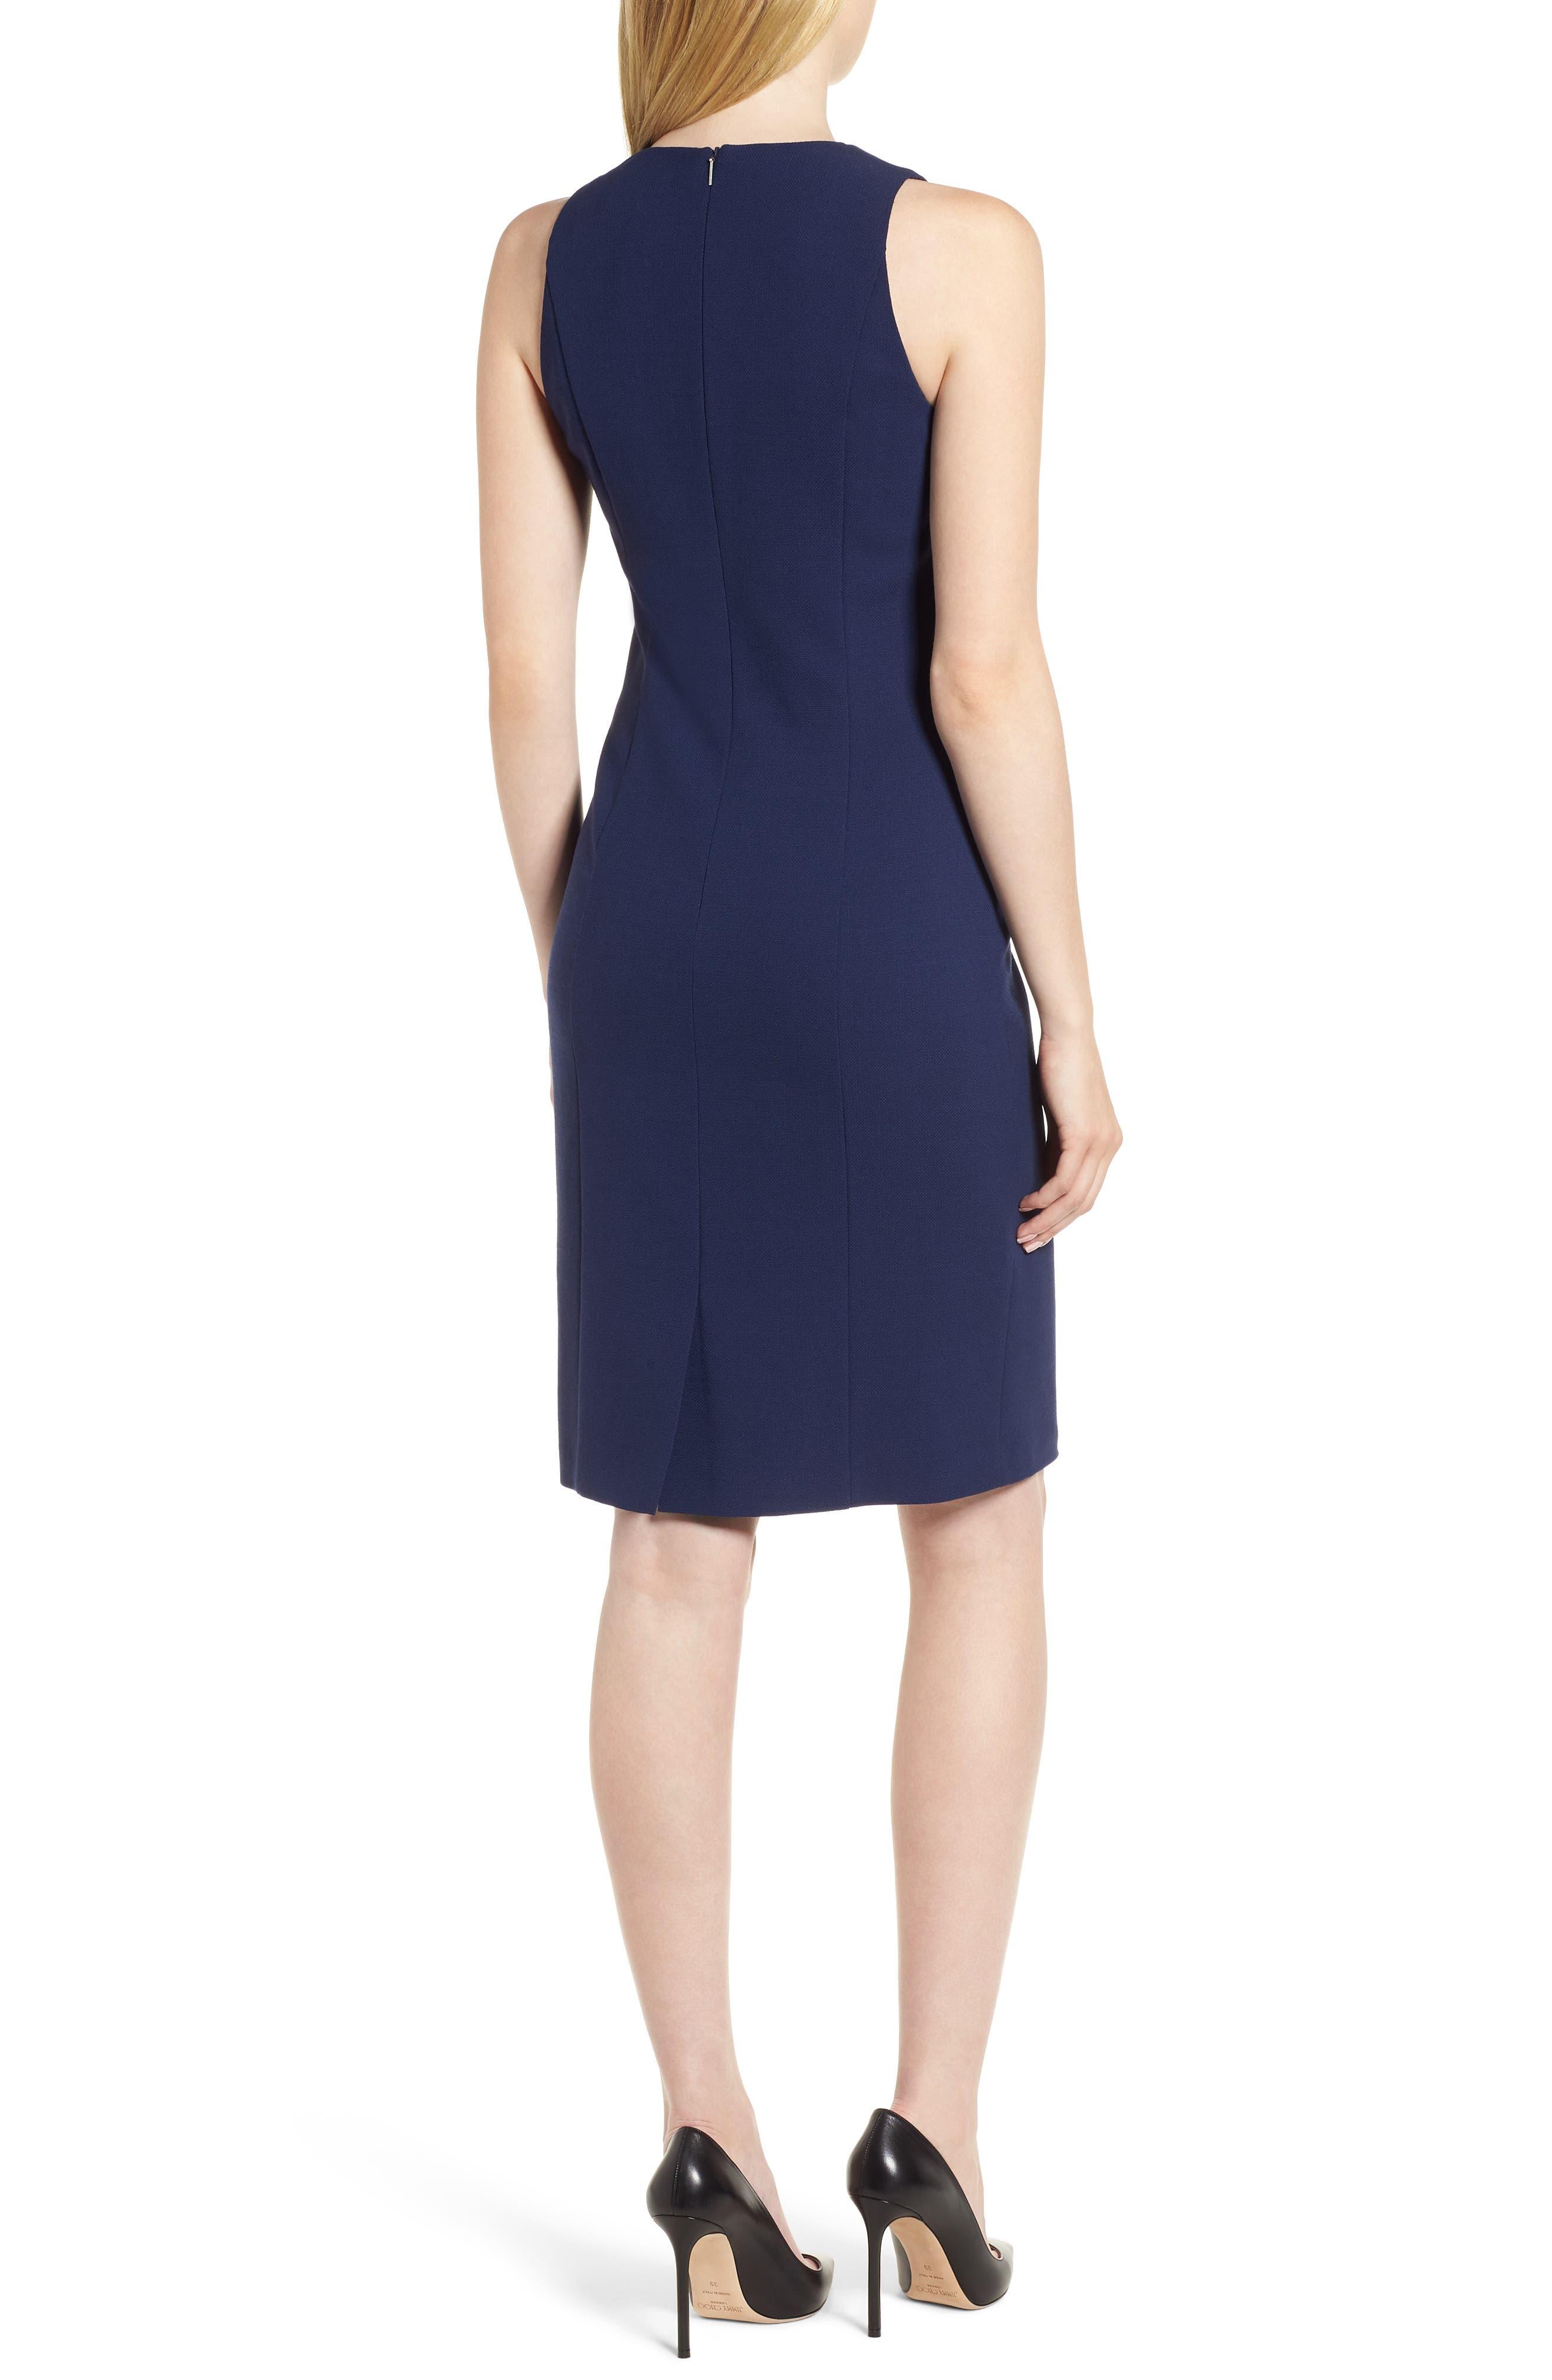 Dibalena Texture Stretch Dress,                             Alternate thumbnail 2, color,                             Nautical